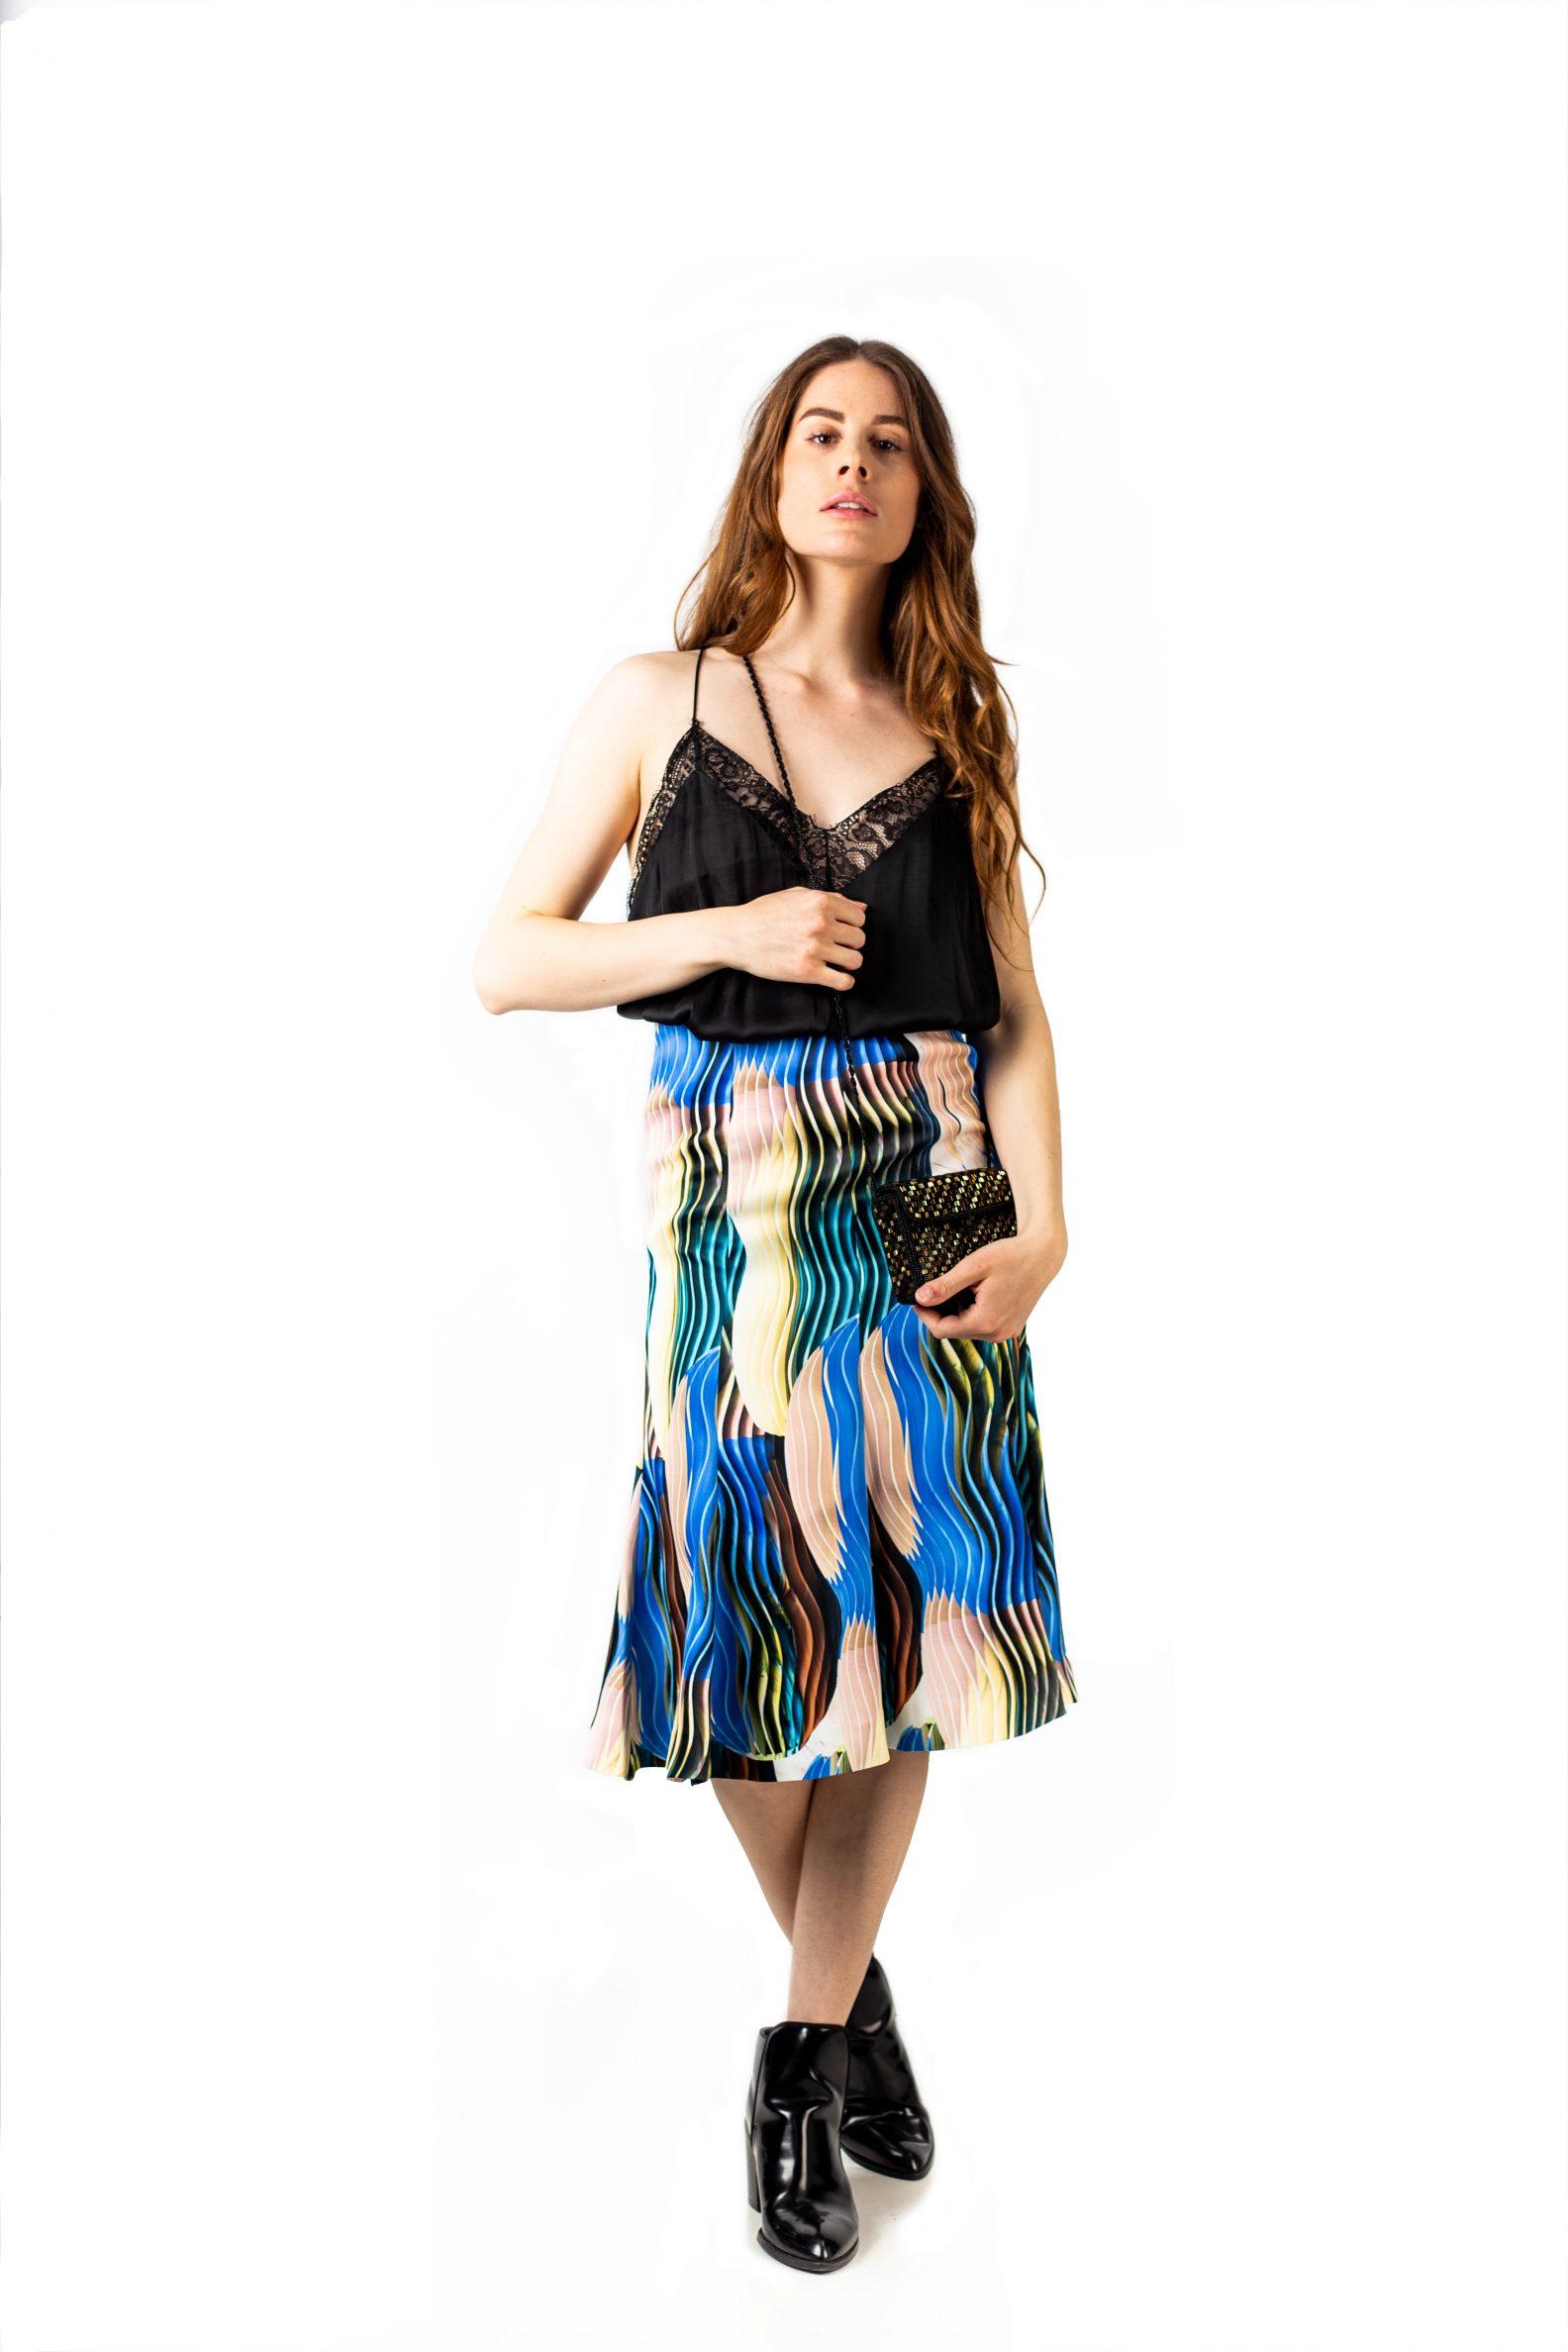 Jupe midi-Midi skirt with pattern-1-jupe-midi-affaires-etrangeres-paris-mode-ethnique-coreenne-vleeda